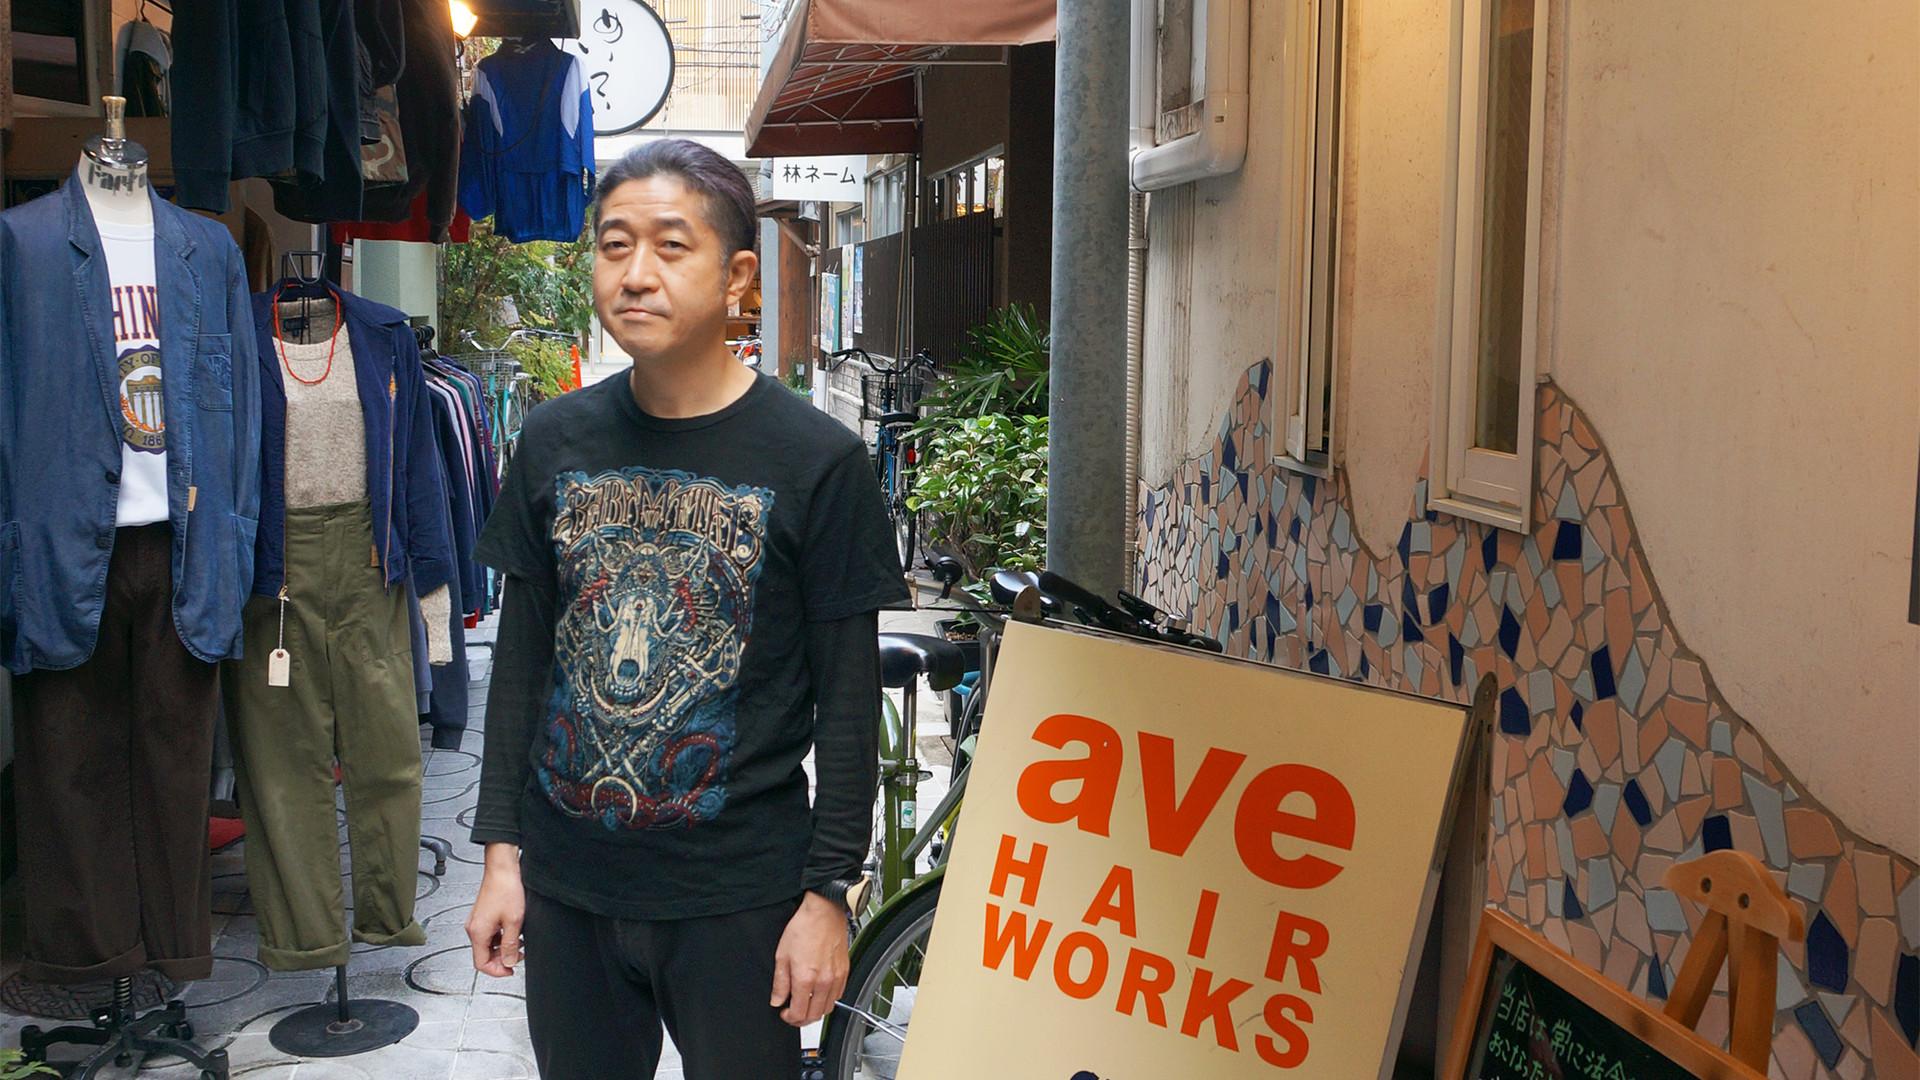 ave HAIR WORKS